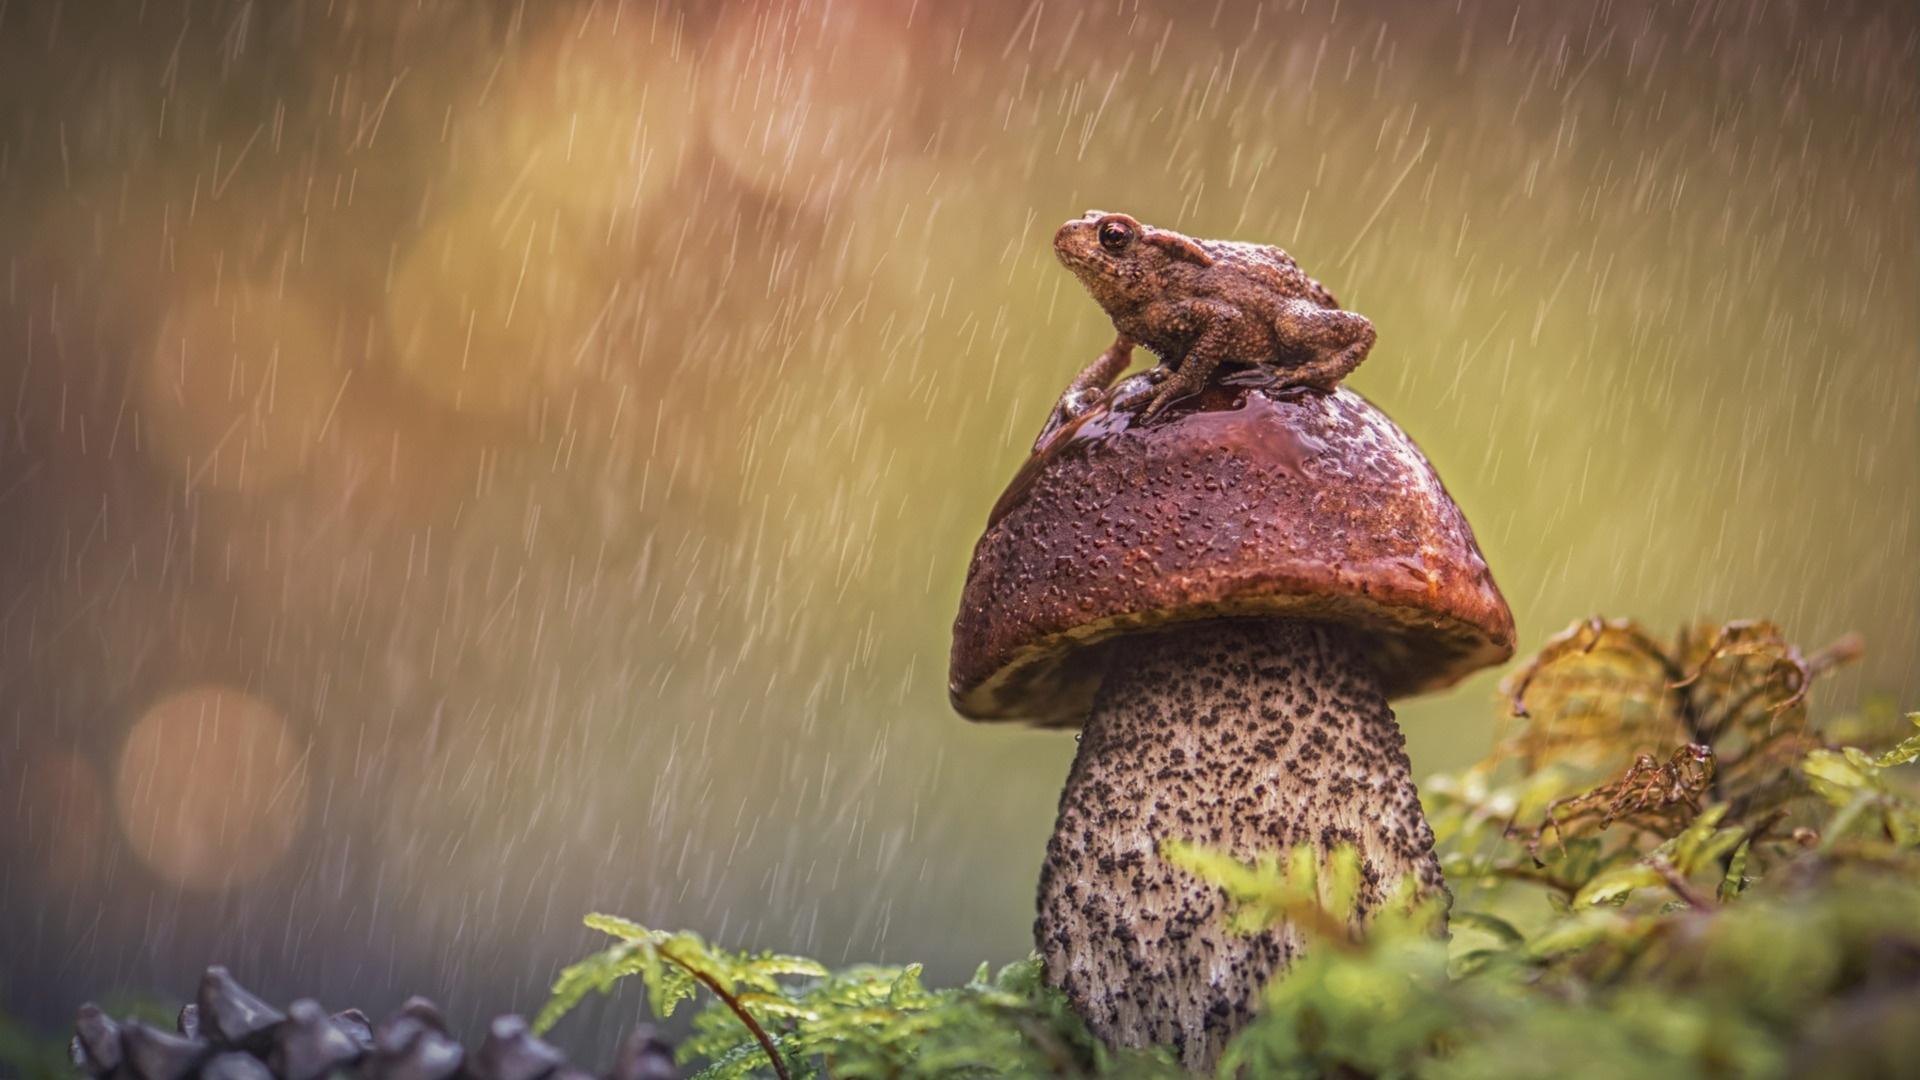 Macro Mushrooms free image